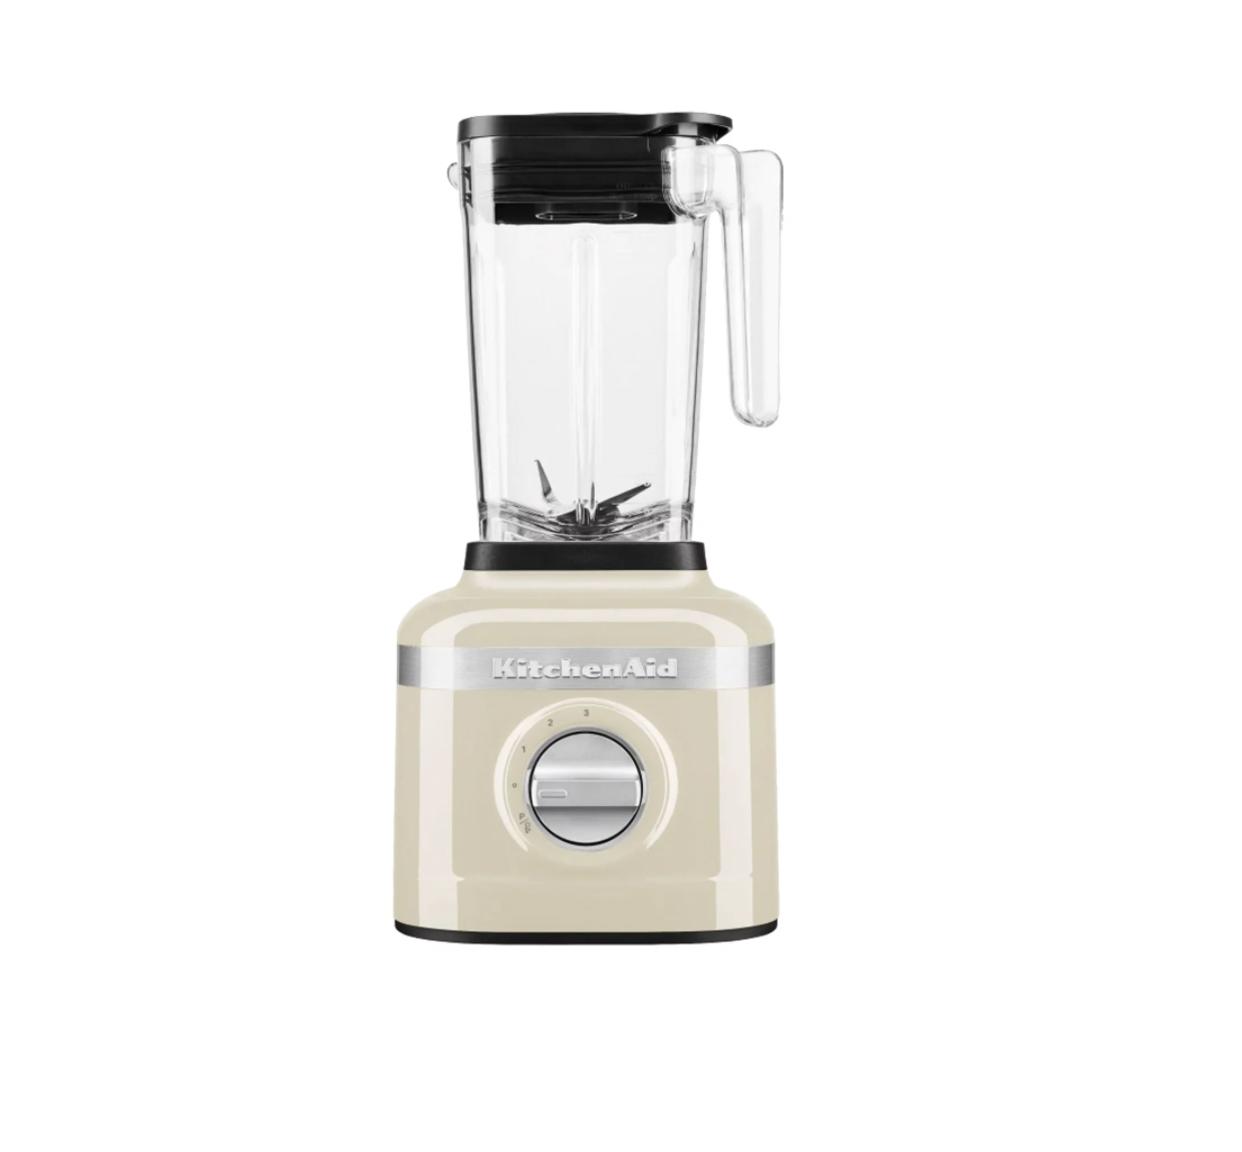 KitchenAid K150 3 Speed Ice Crushing Blender 1.4L Almond Cream